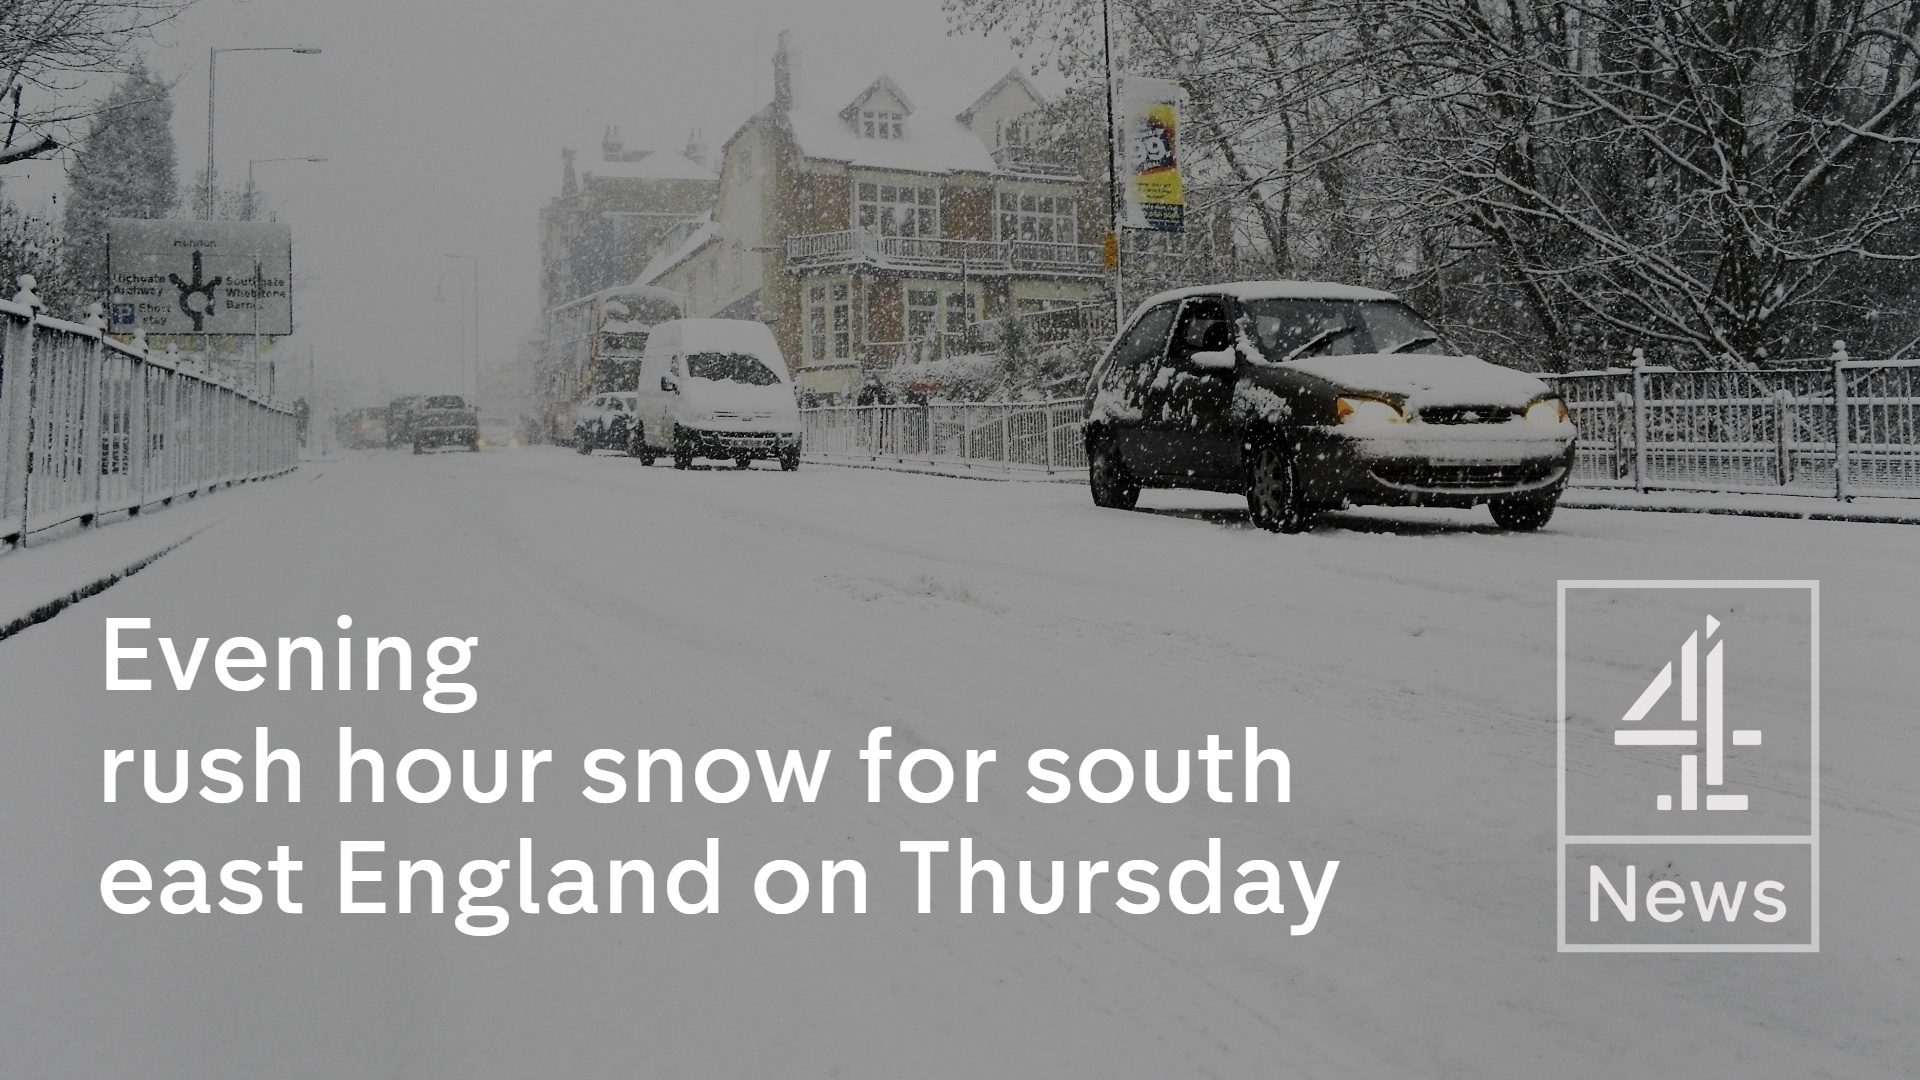 Evening rush hour snow for south east England on Thursday